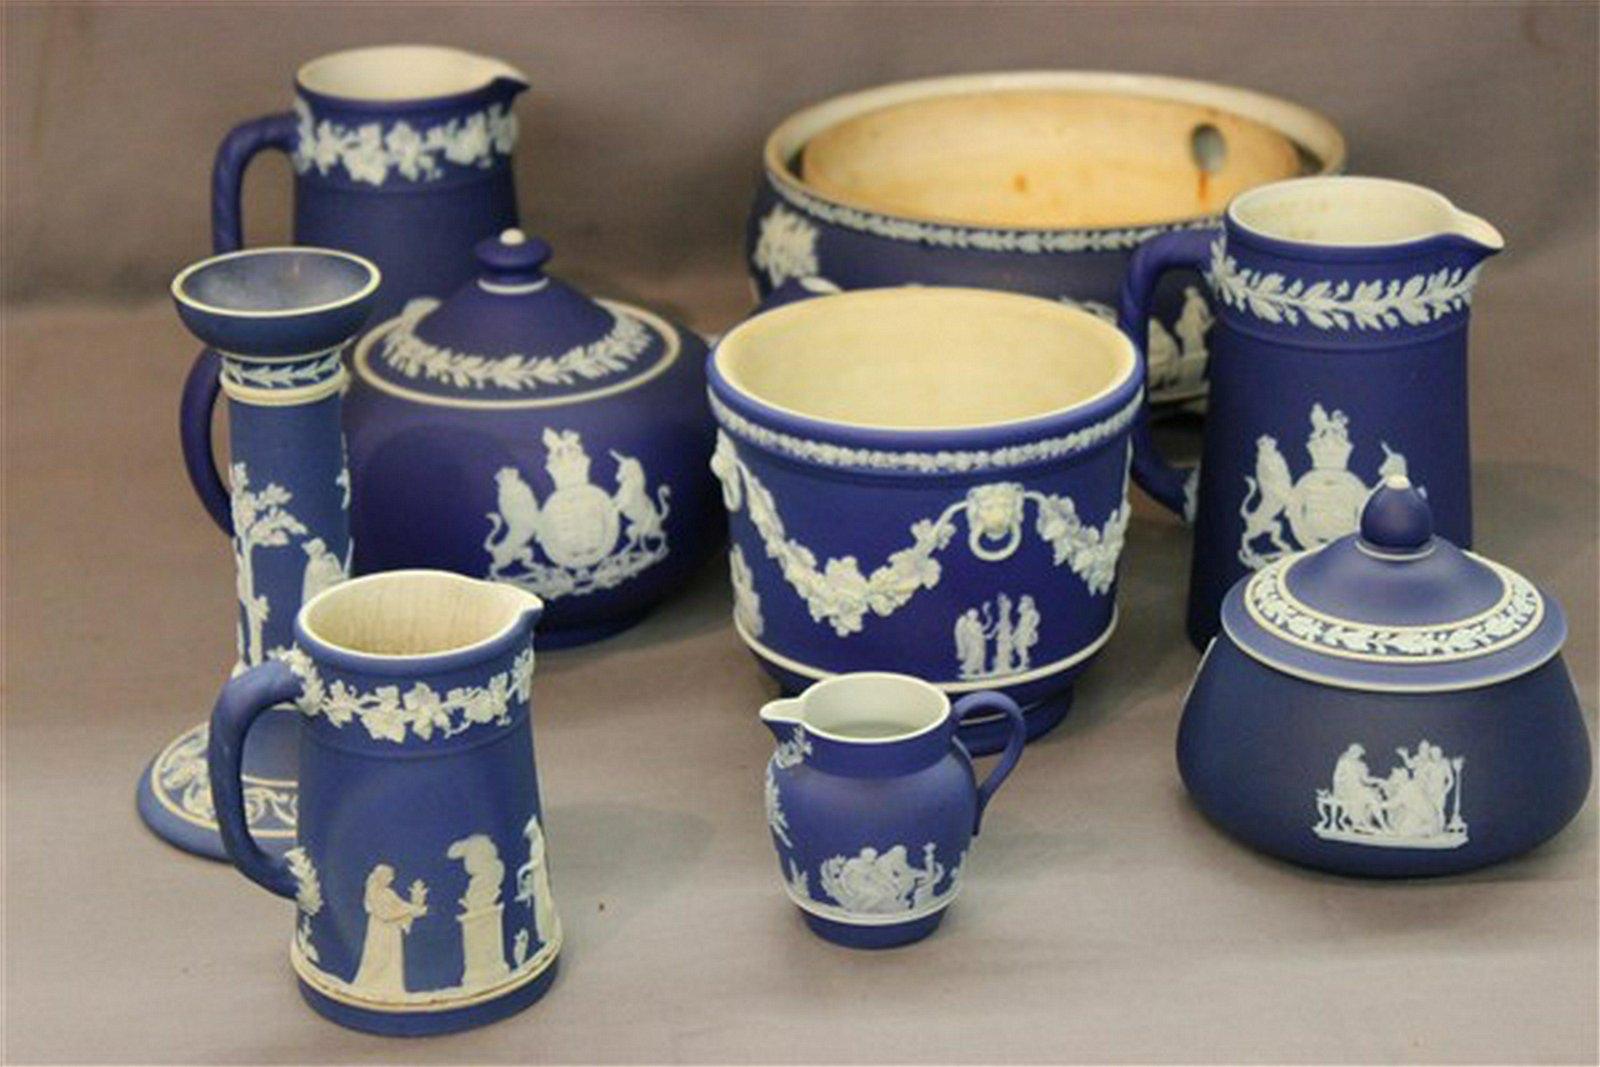 Collection of Wedgwood Blue Jasperware Porcelain